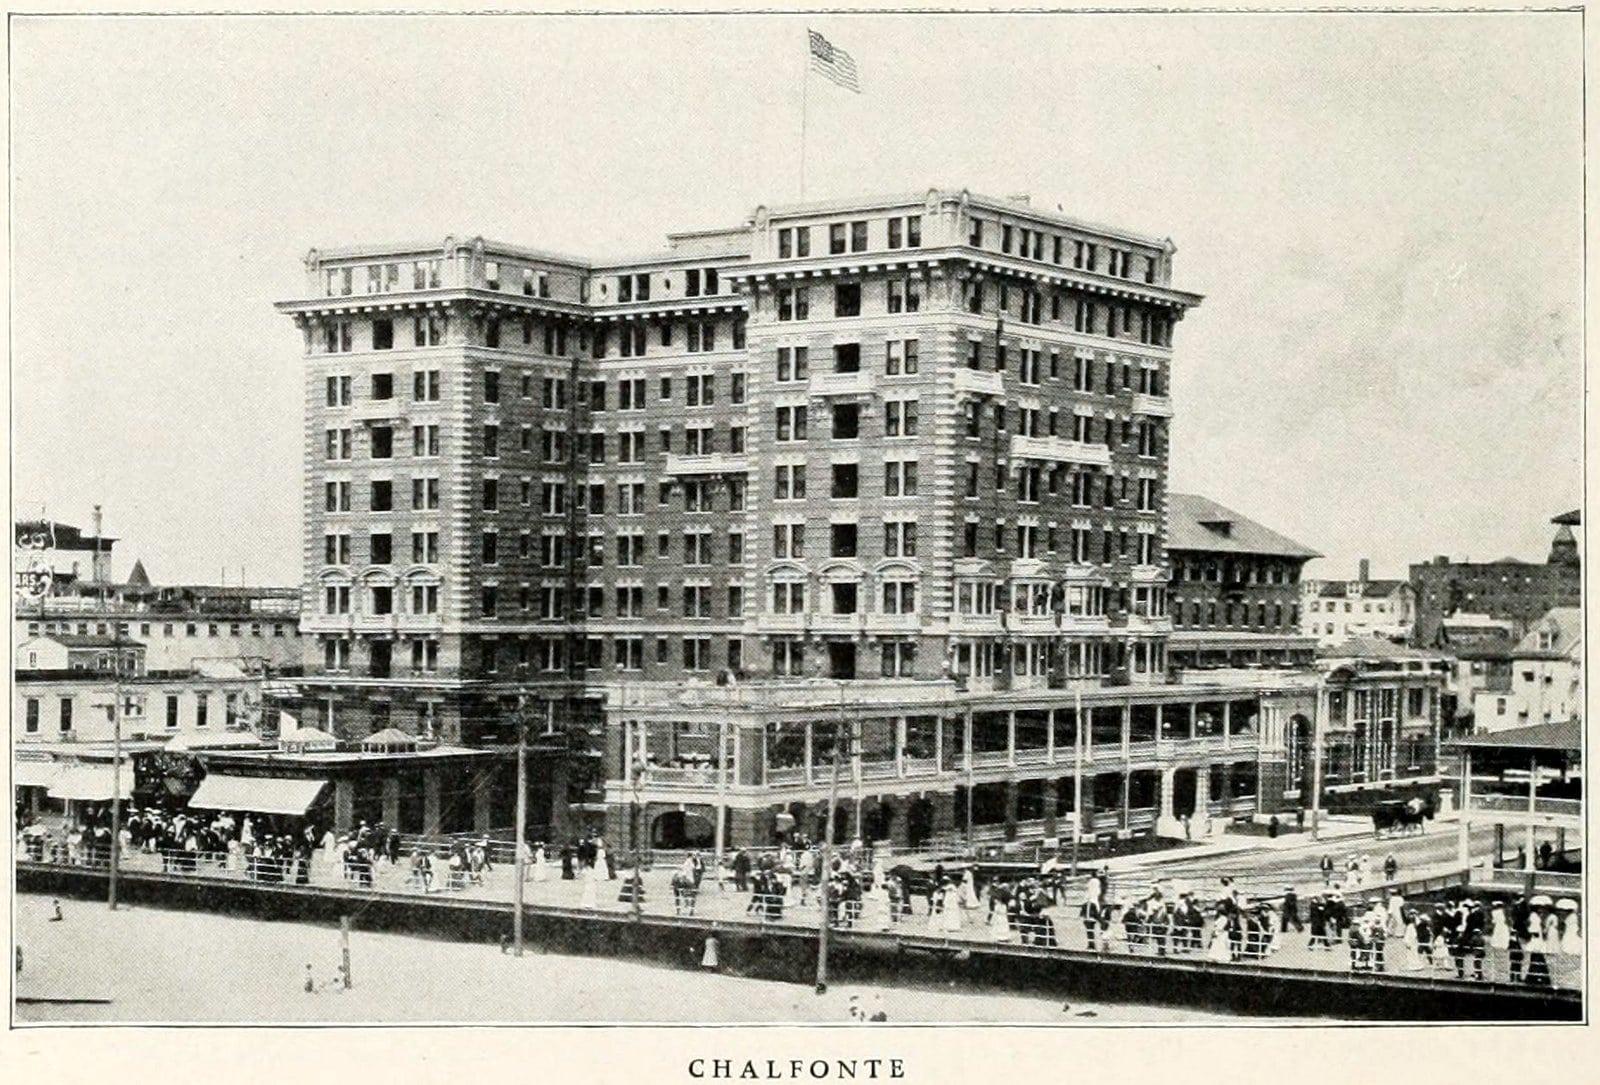 Hotel Chalfonte - Old Atlantic City (1911)